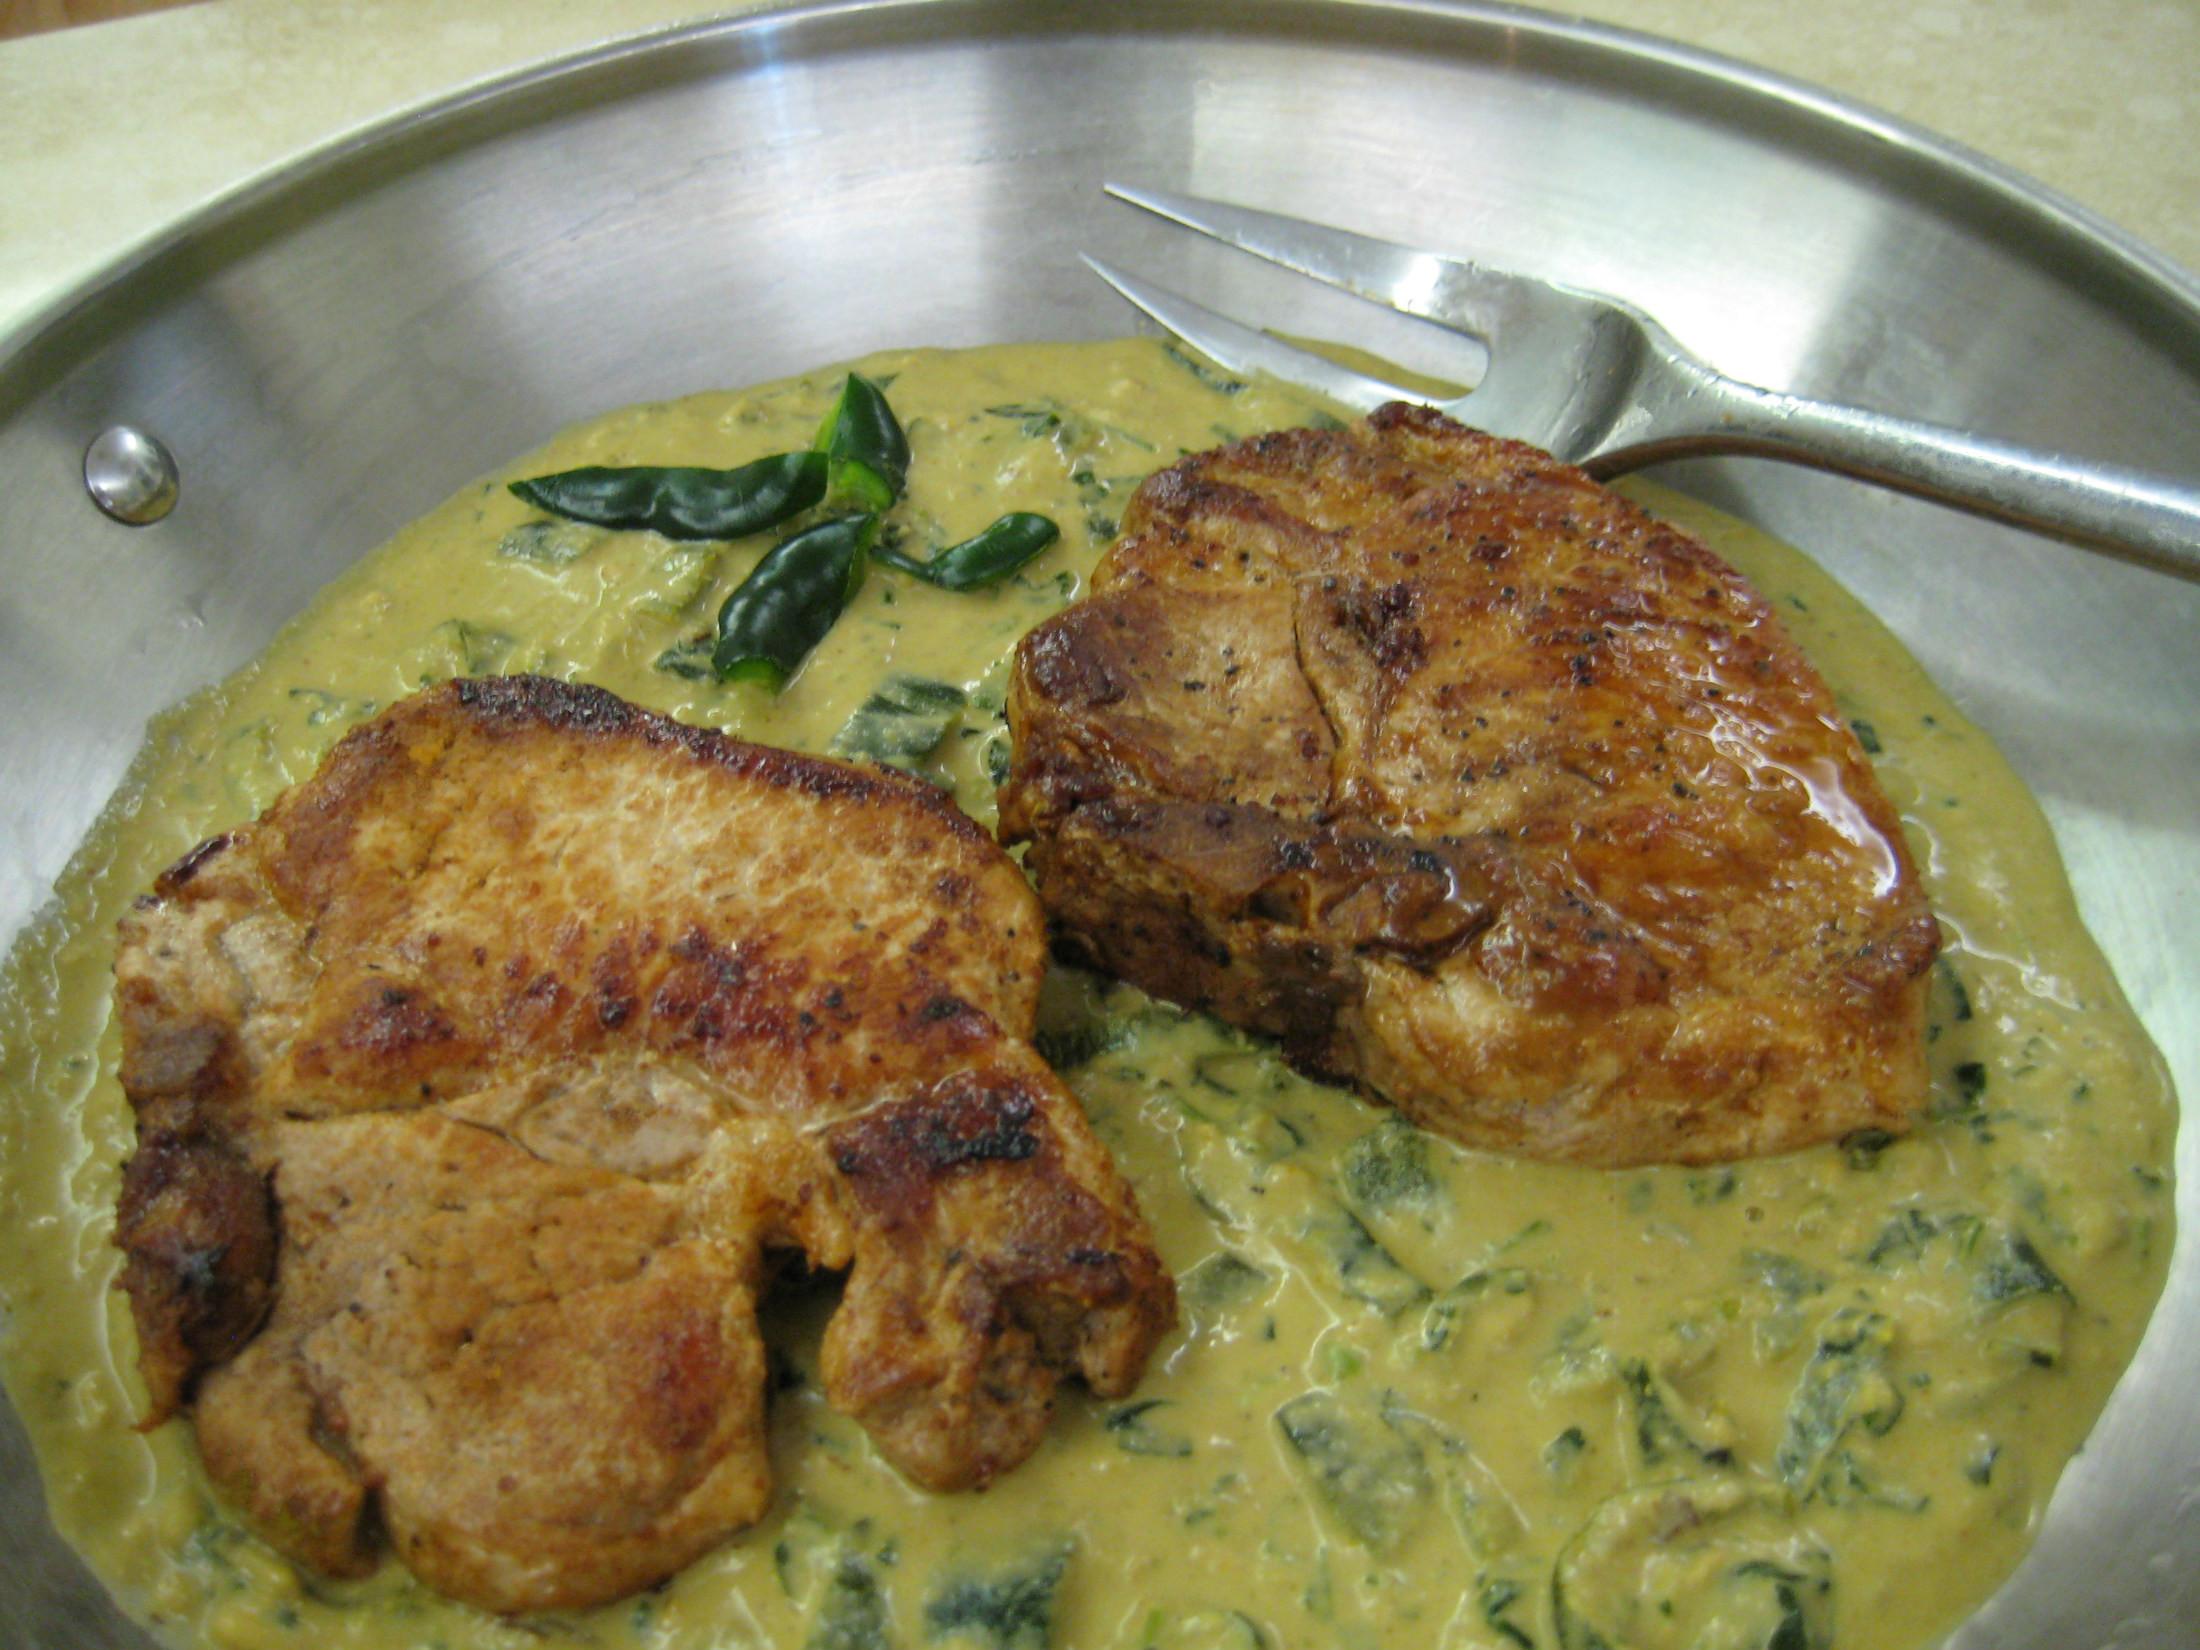 Low Carb Fried Pork Chops  low carb baked pork chops